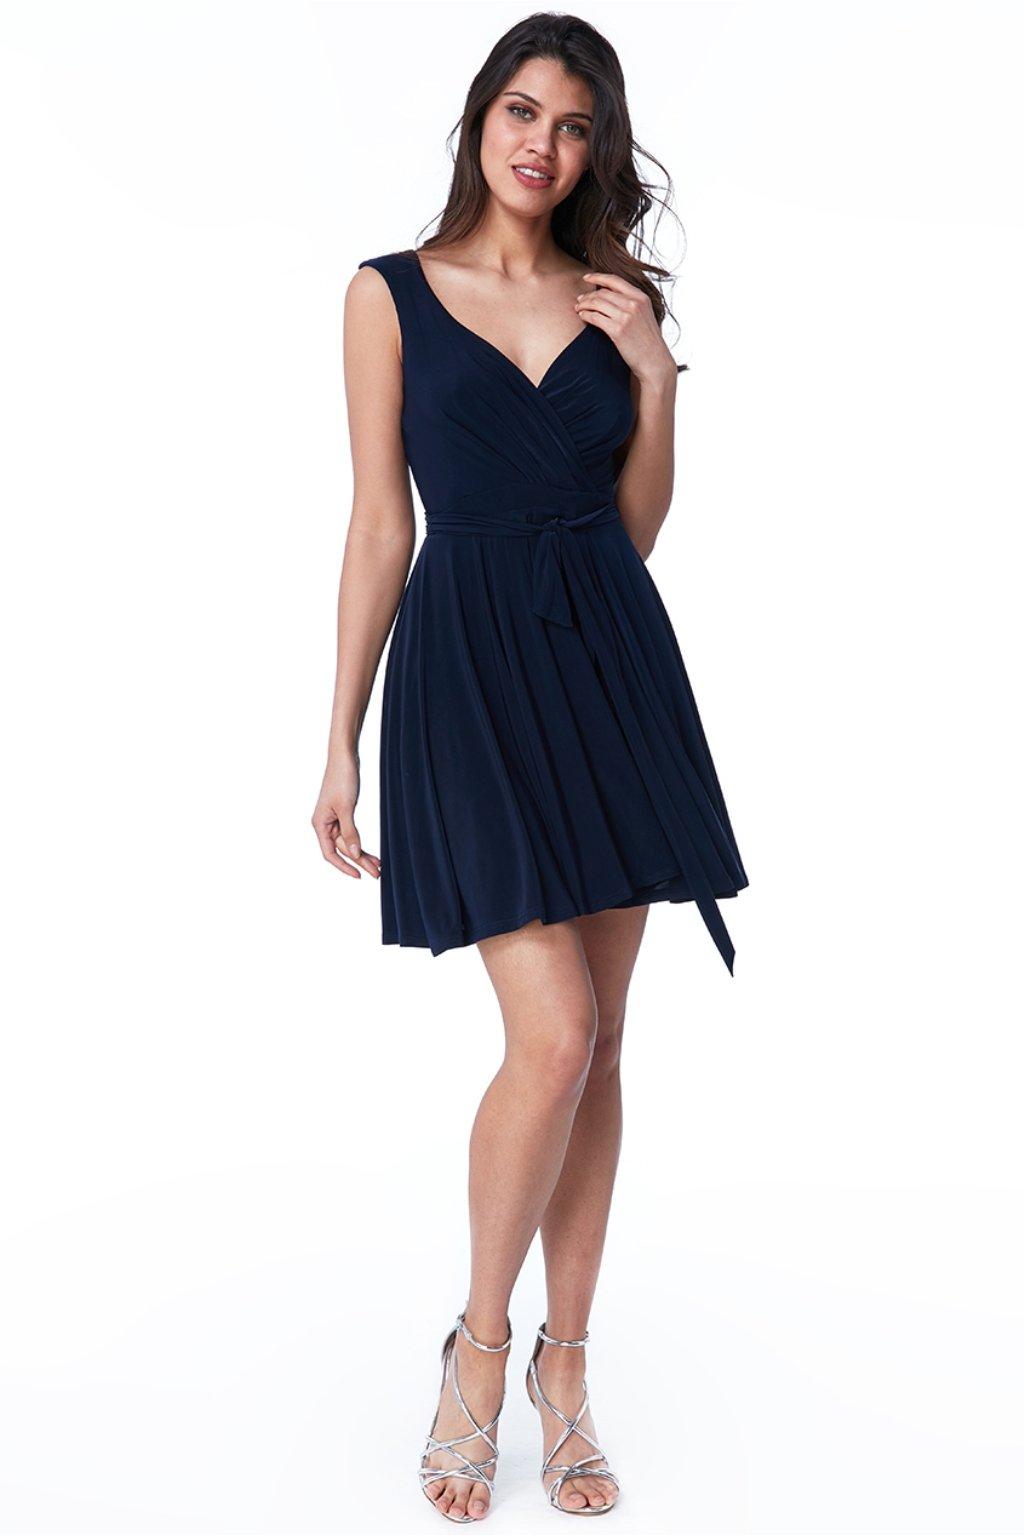 Tmavomodré krátke šaty s áčkovou sukňou